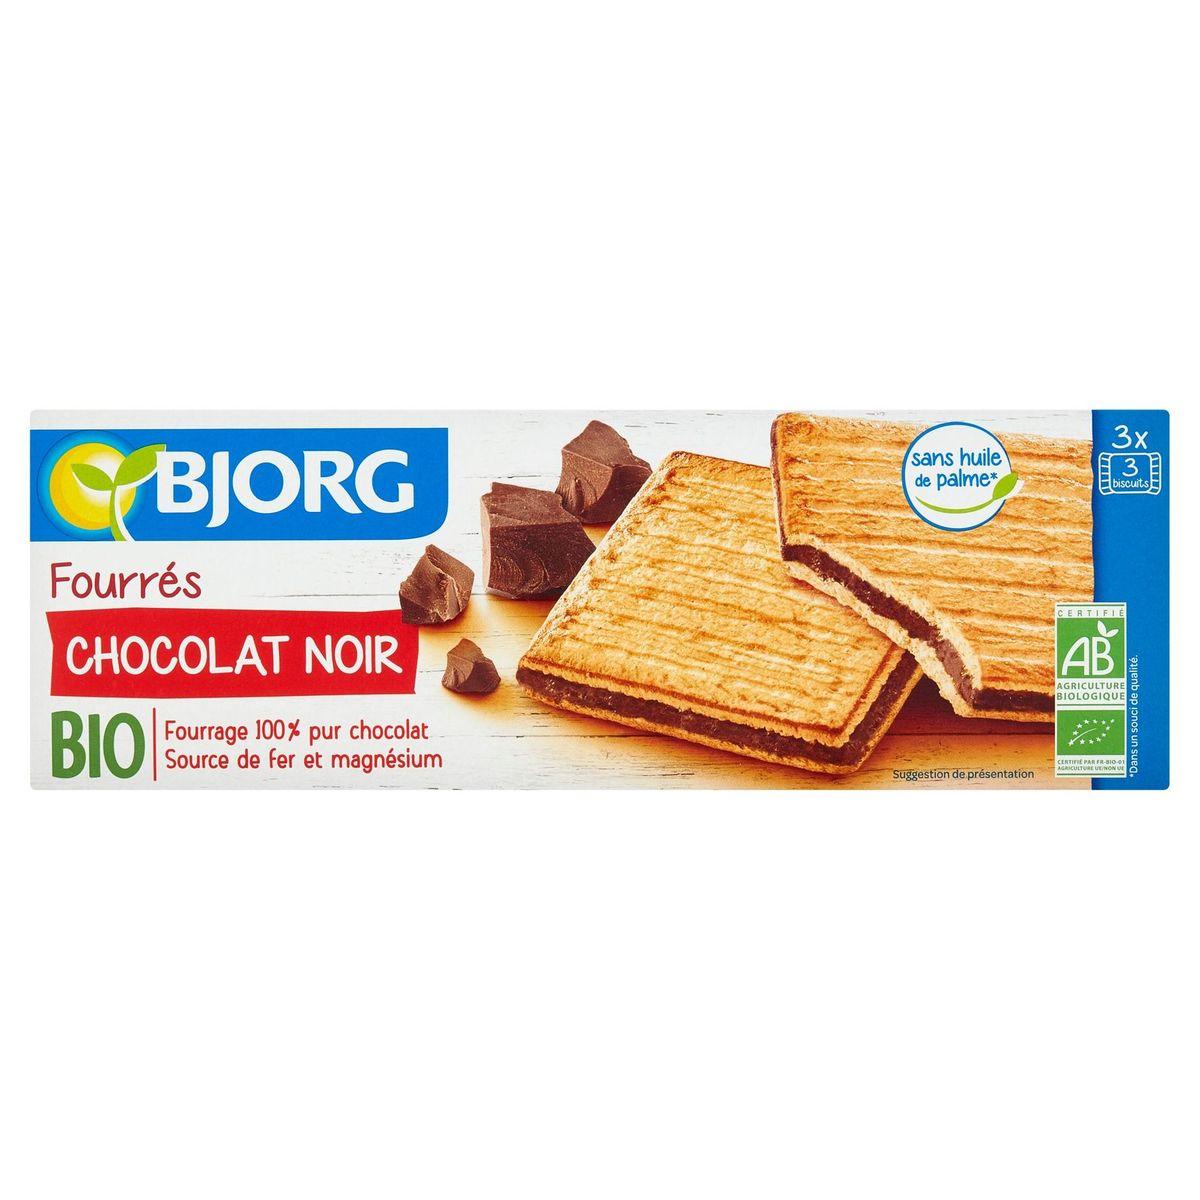 Bjorg Bio Fourrés Pure Chocolade 3 x 3 Biscuits 225 g